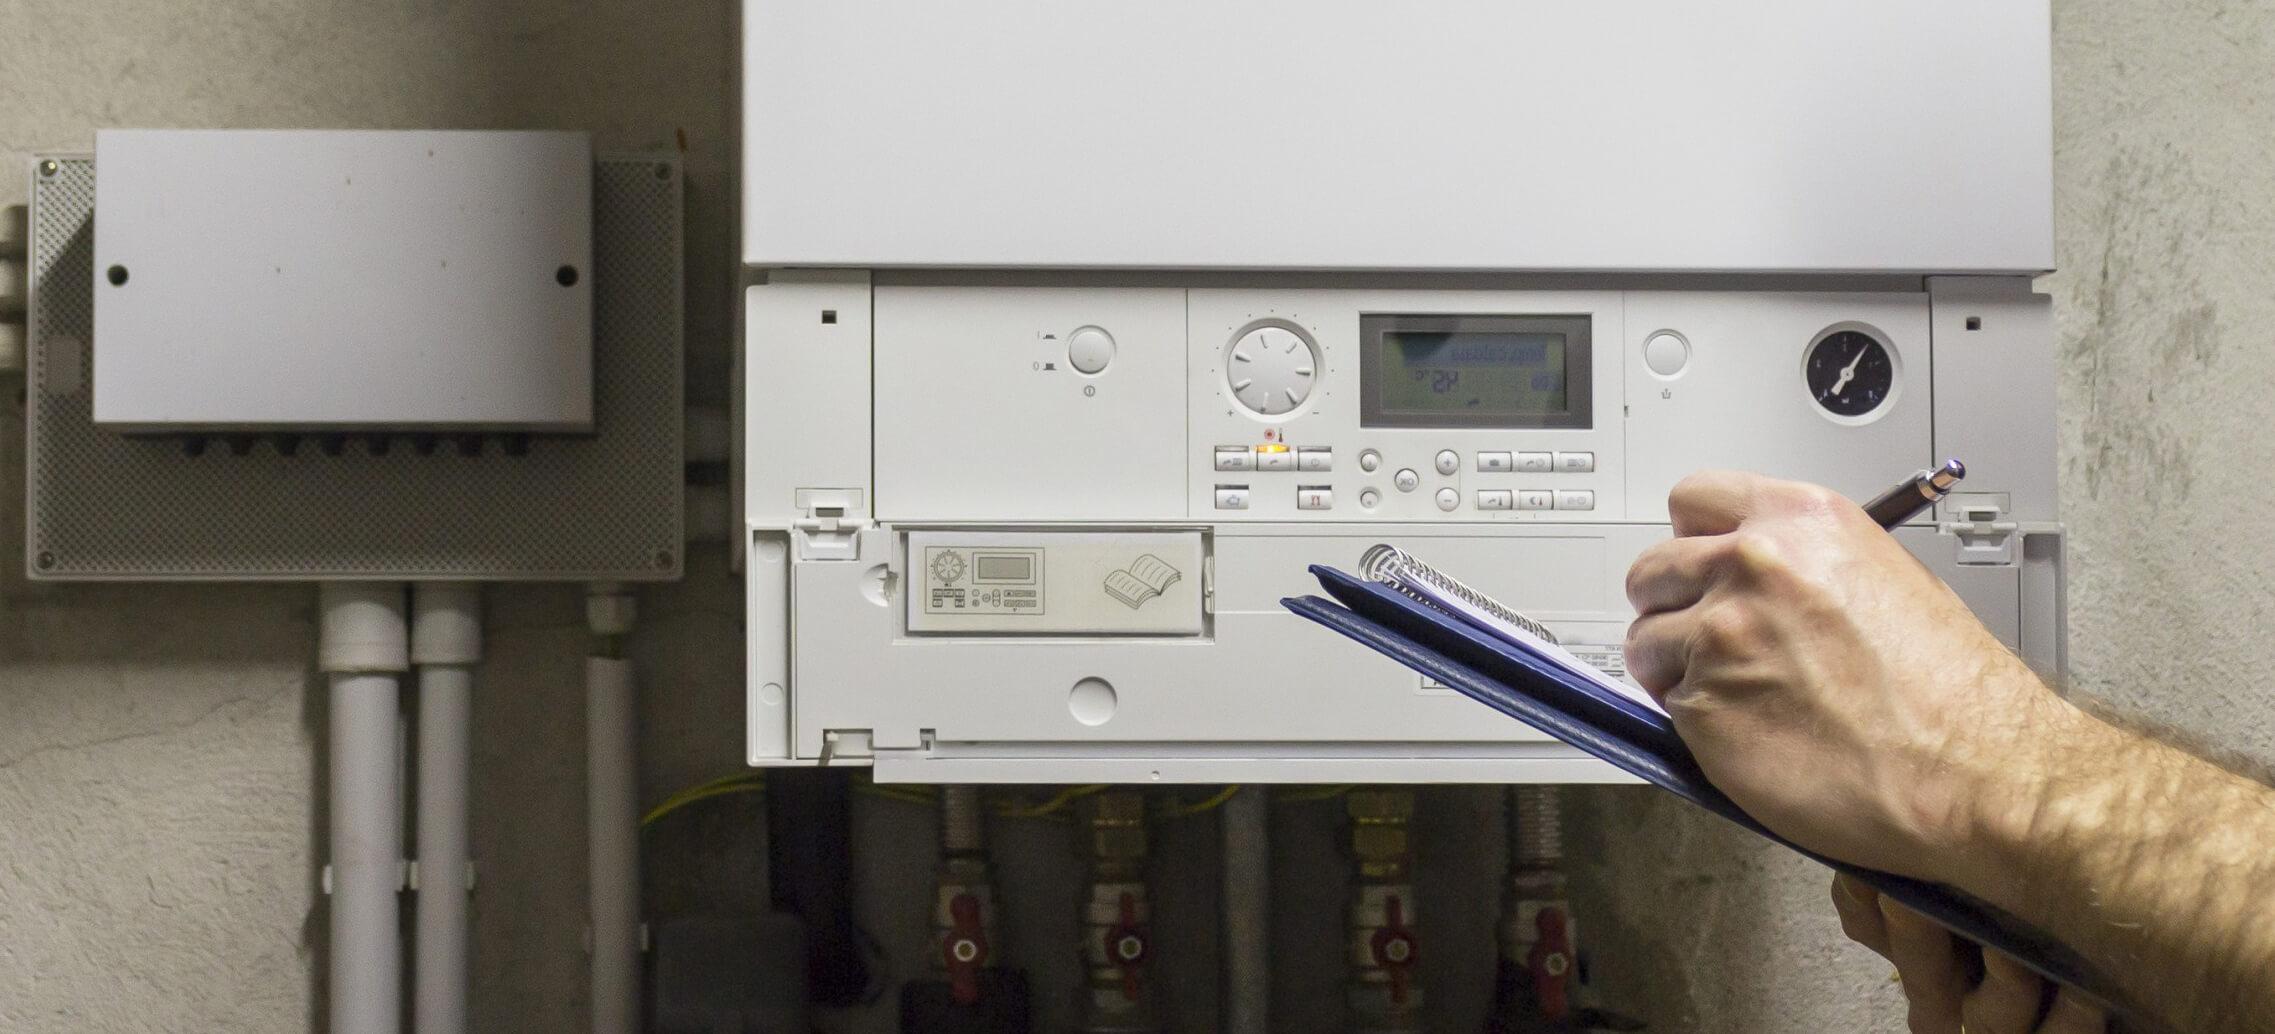 An image of modern condensing boiler